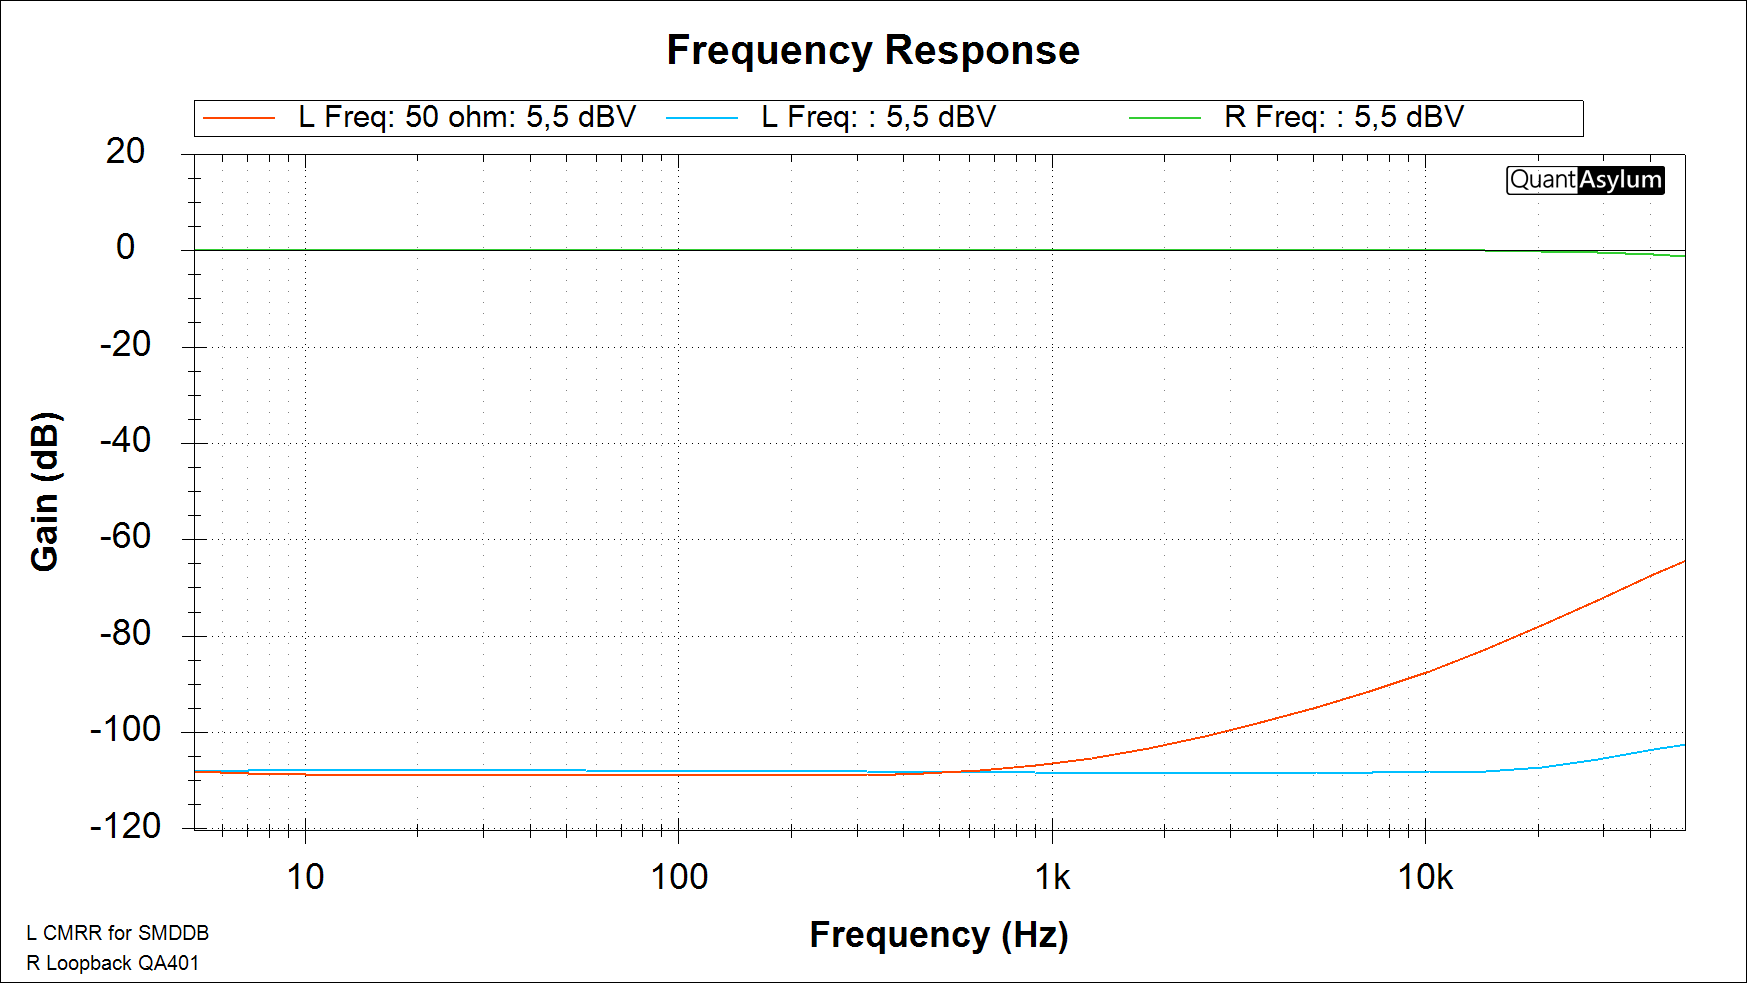 SMDDB CMRR 5 - 50k Hz.png